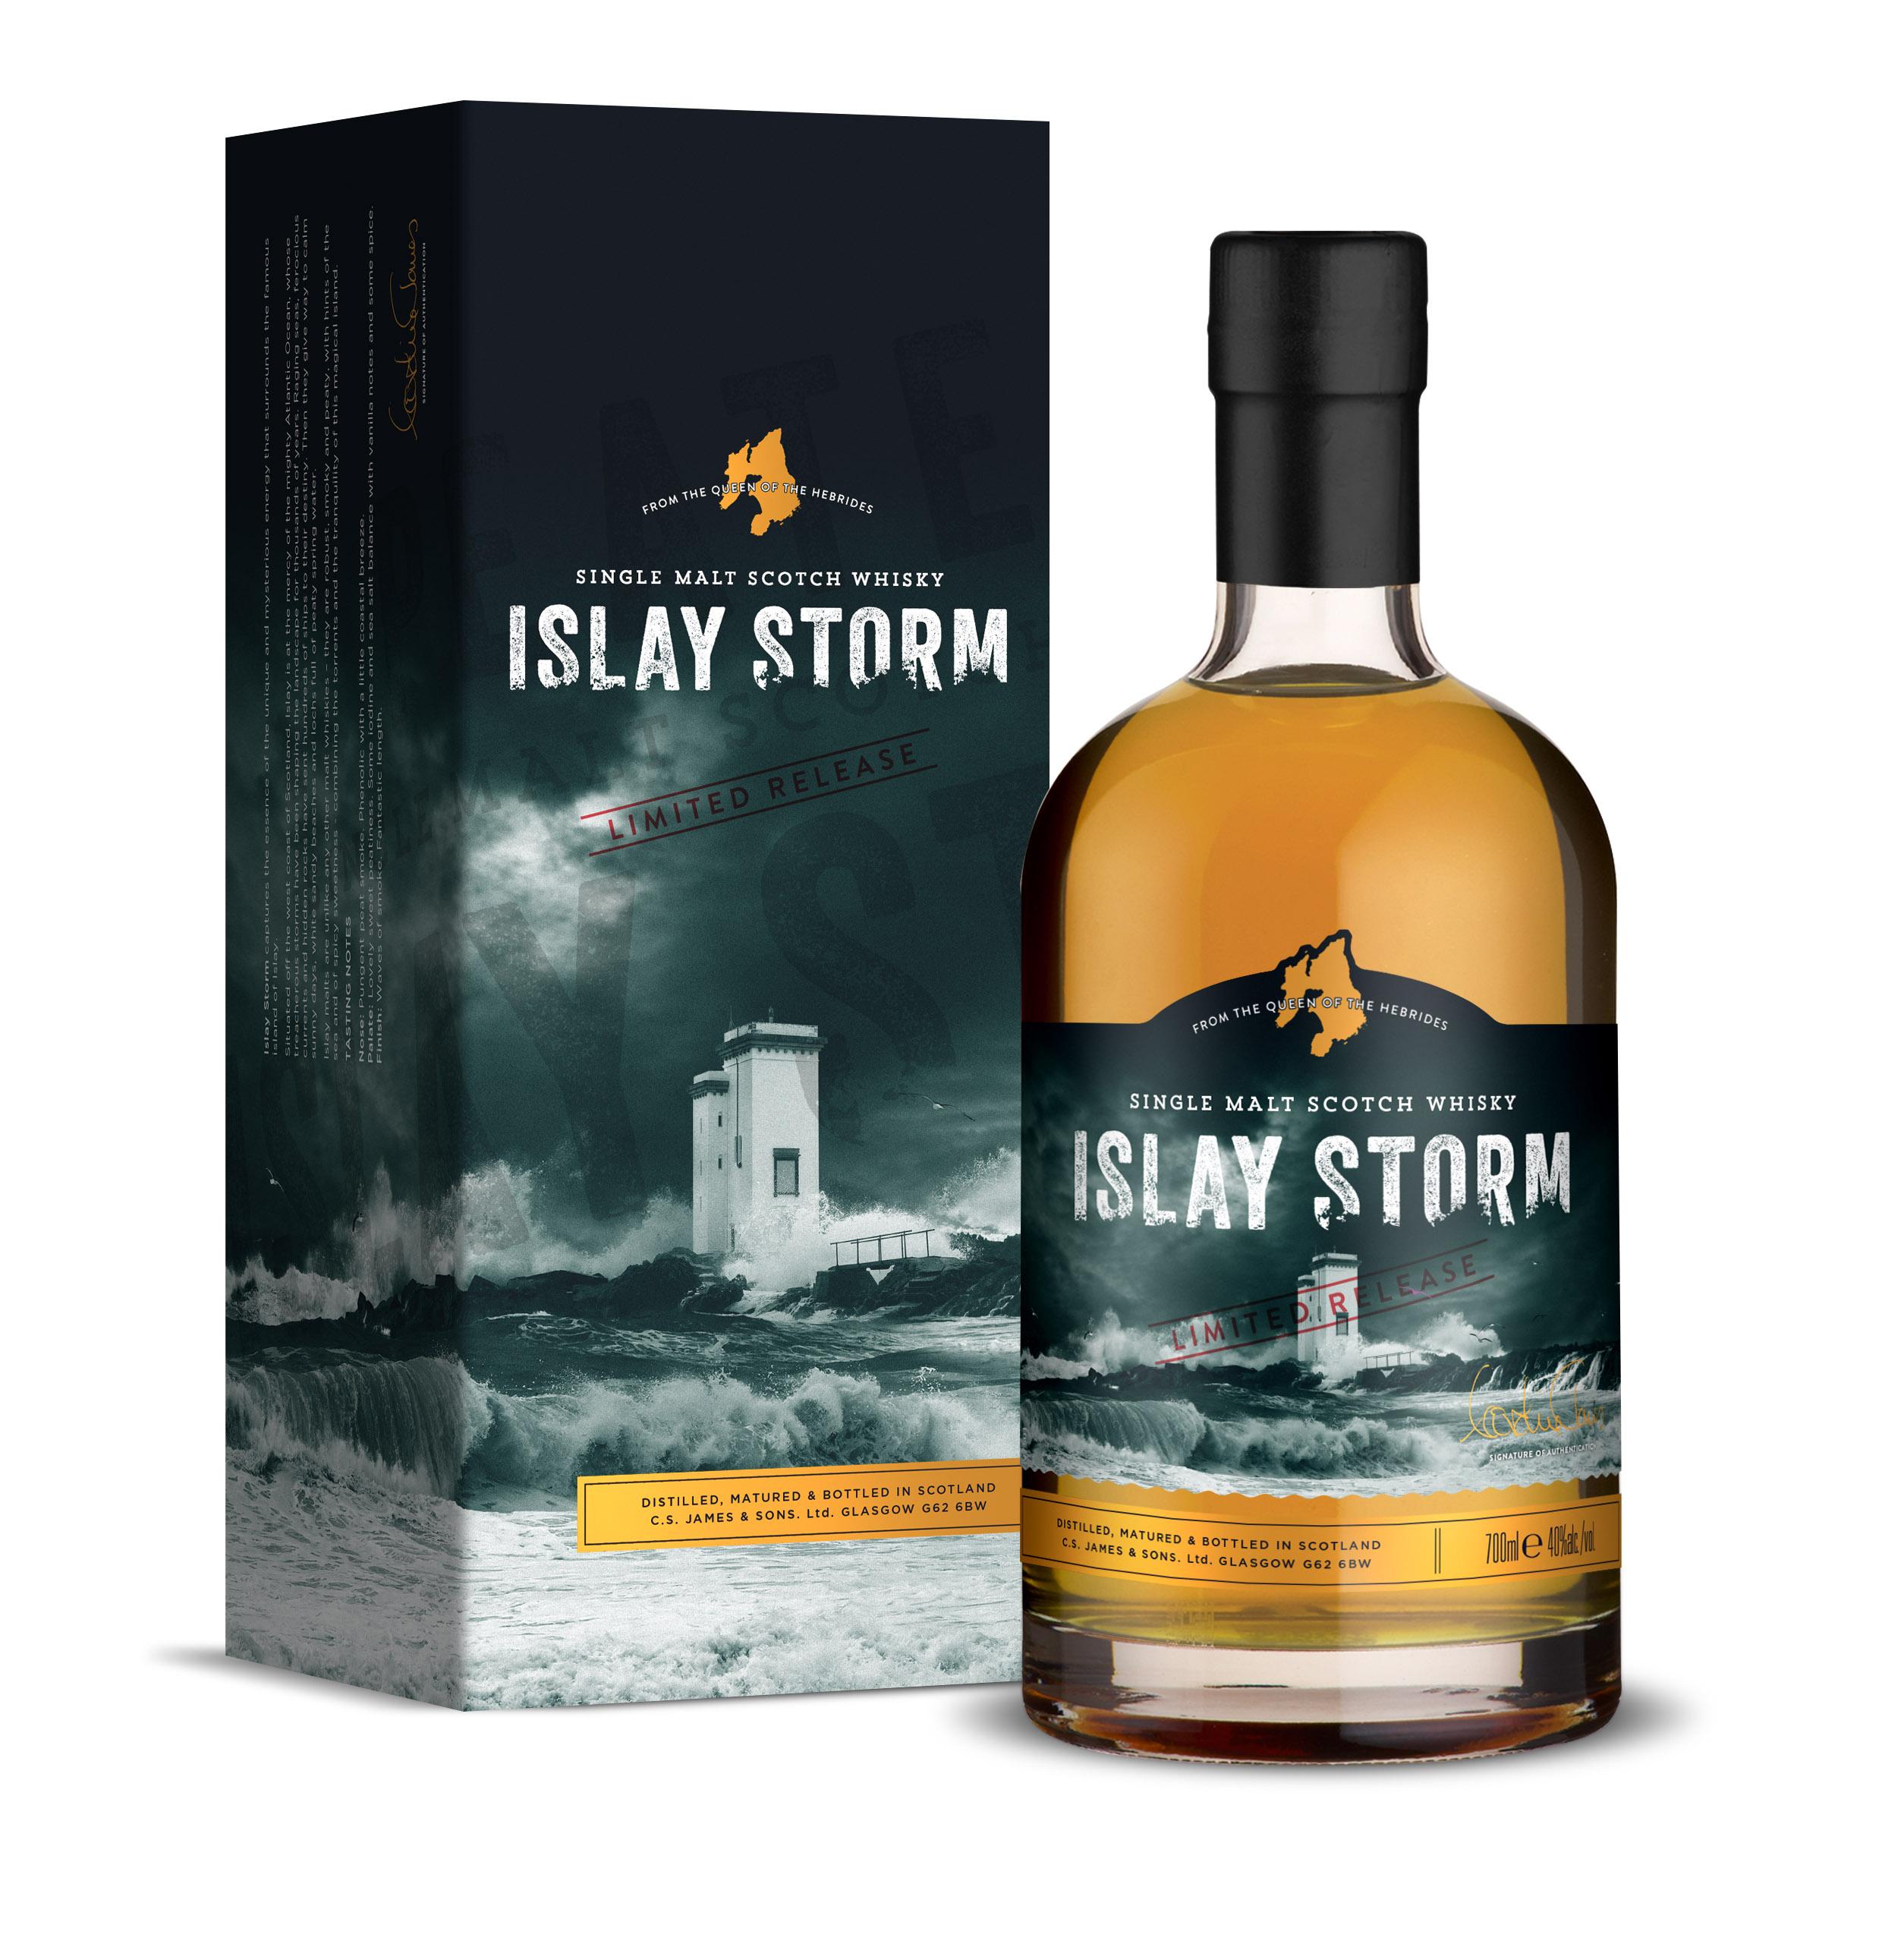 Islay Storm | Single Malt Scotch Whisky